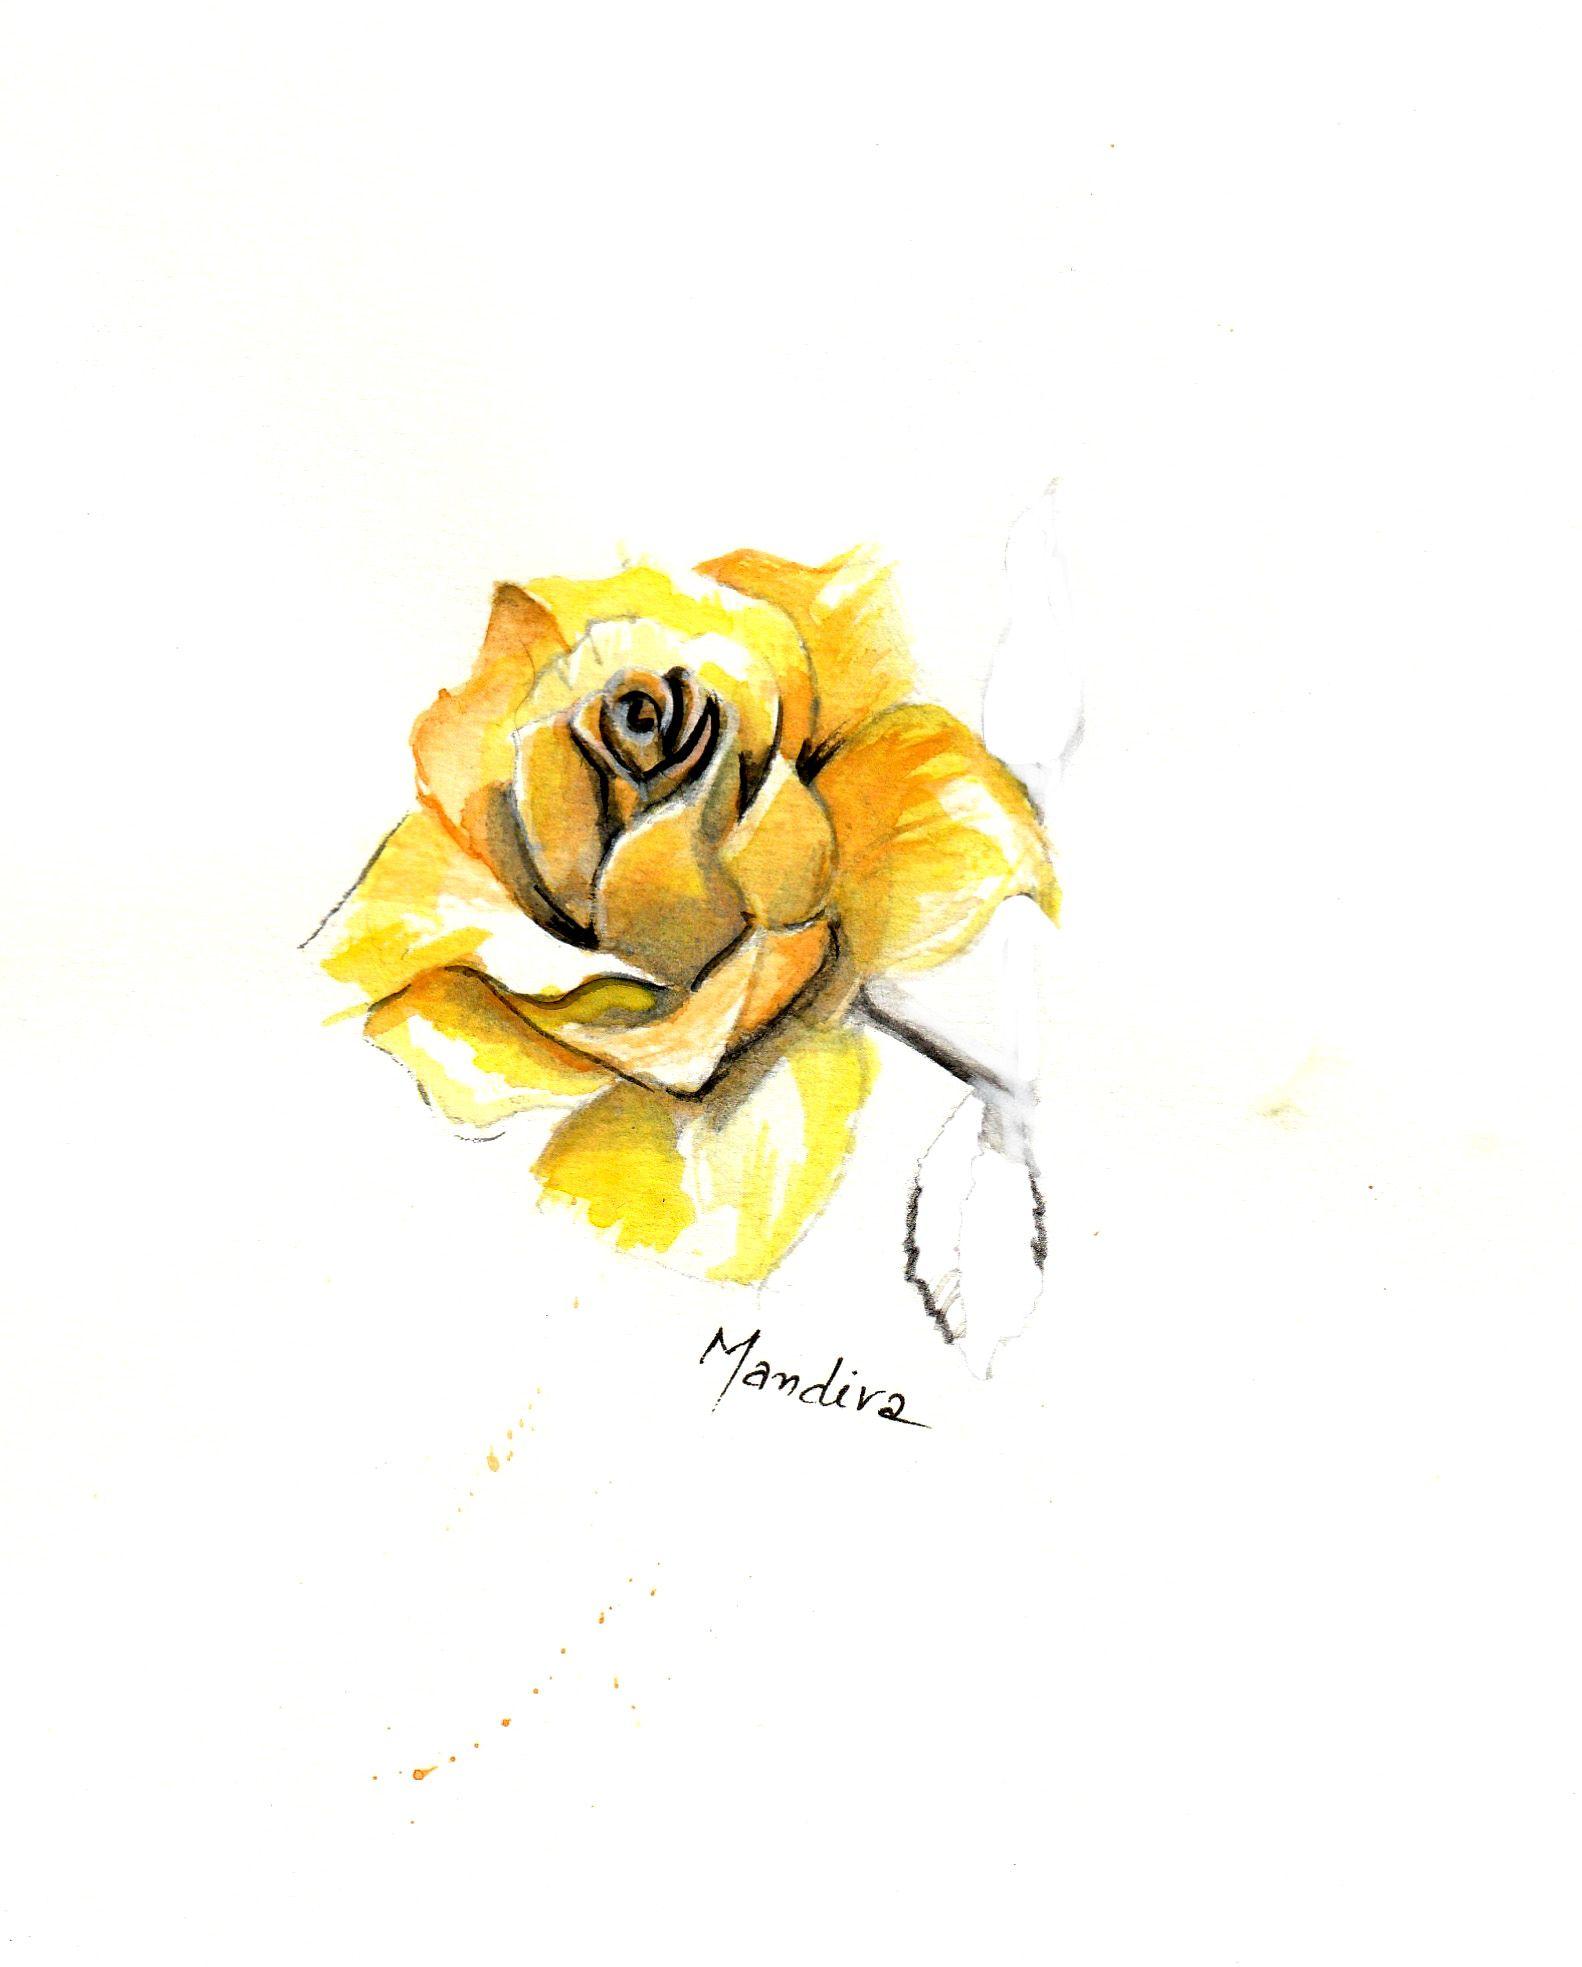 Yellow Rose Tattoo Custom Design By Mandira Watercolour Tattoos